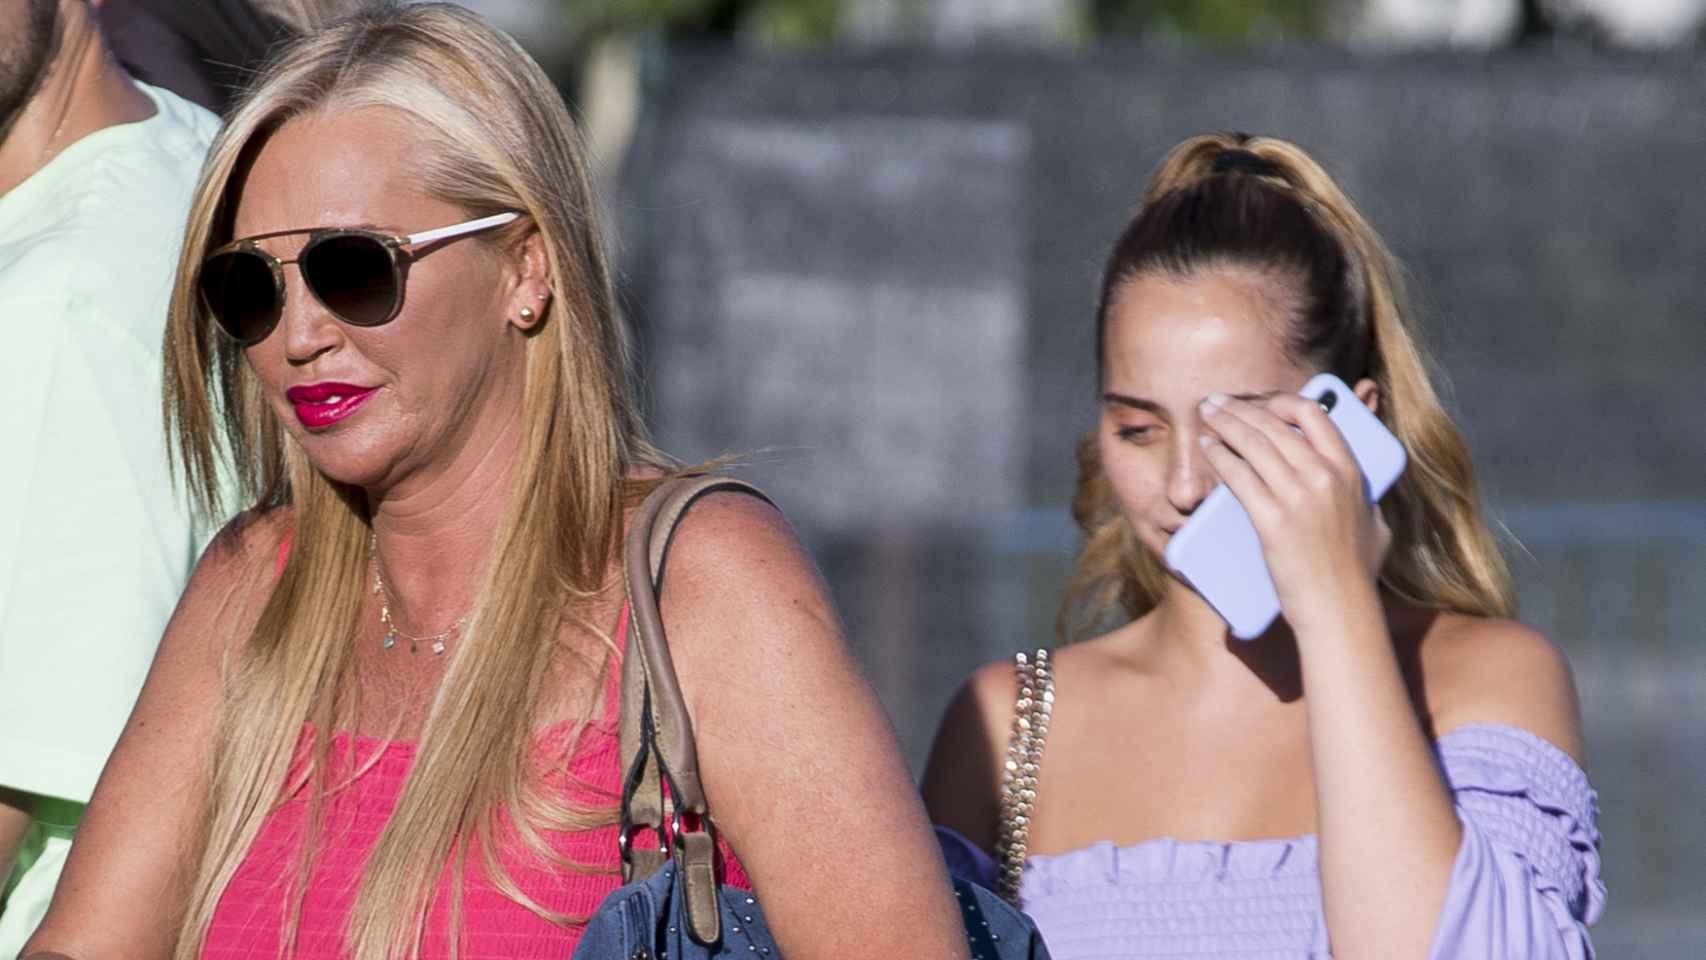 La vida secreta de Andrea Janeiro: la hija de Belén que se niega a ser famosa cumple 20 años